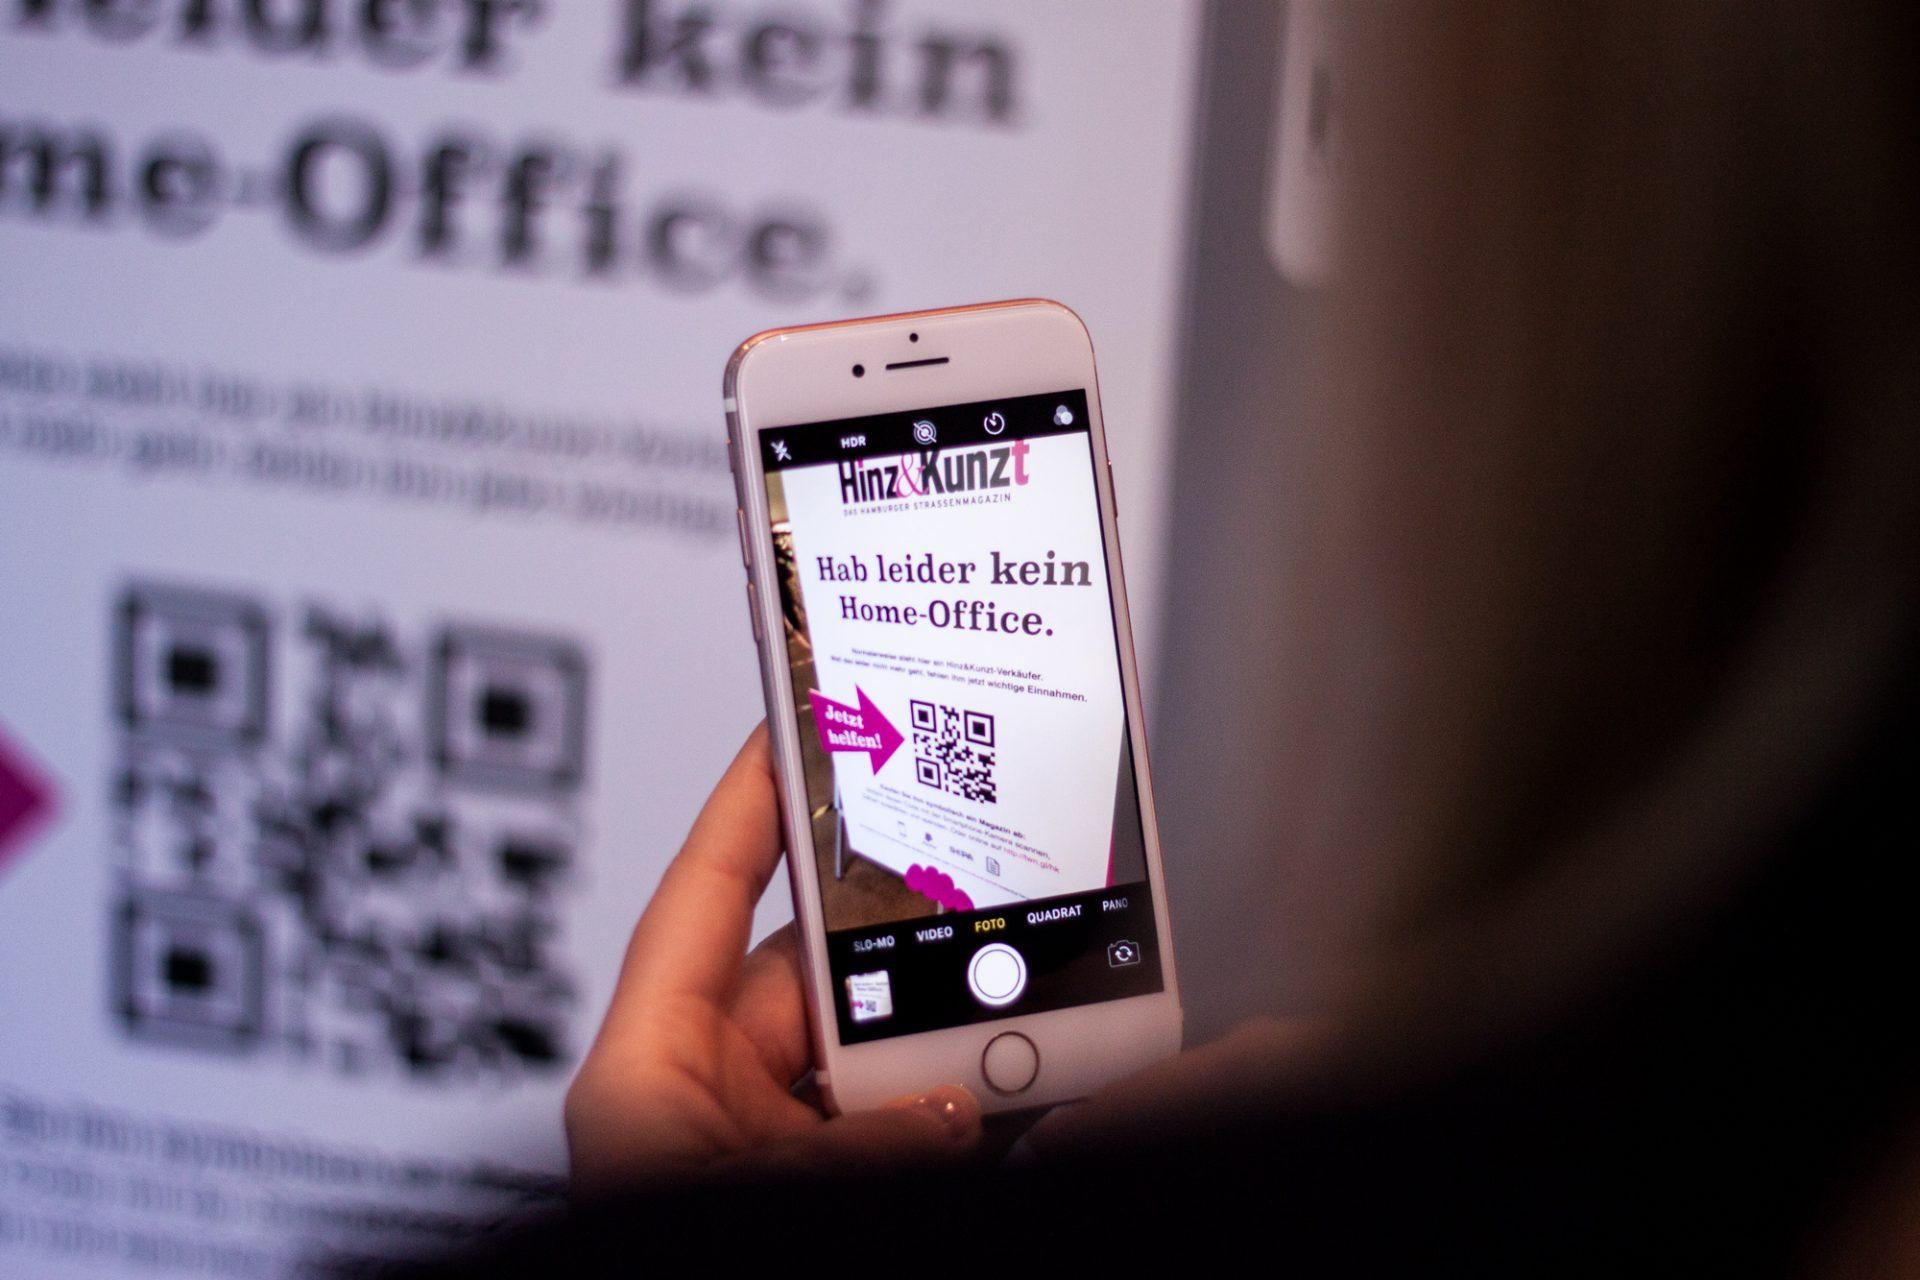 Philipp und Keuntje entwickelt kontaktlosen Hinz Kunzt Verkäufer QR Code